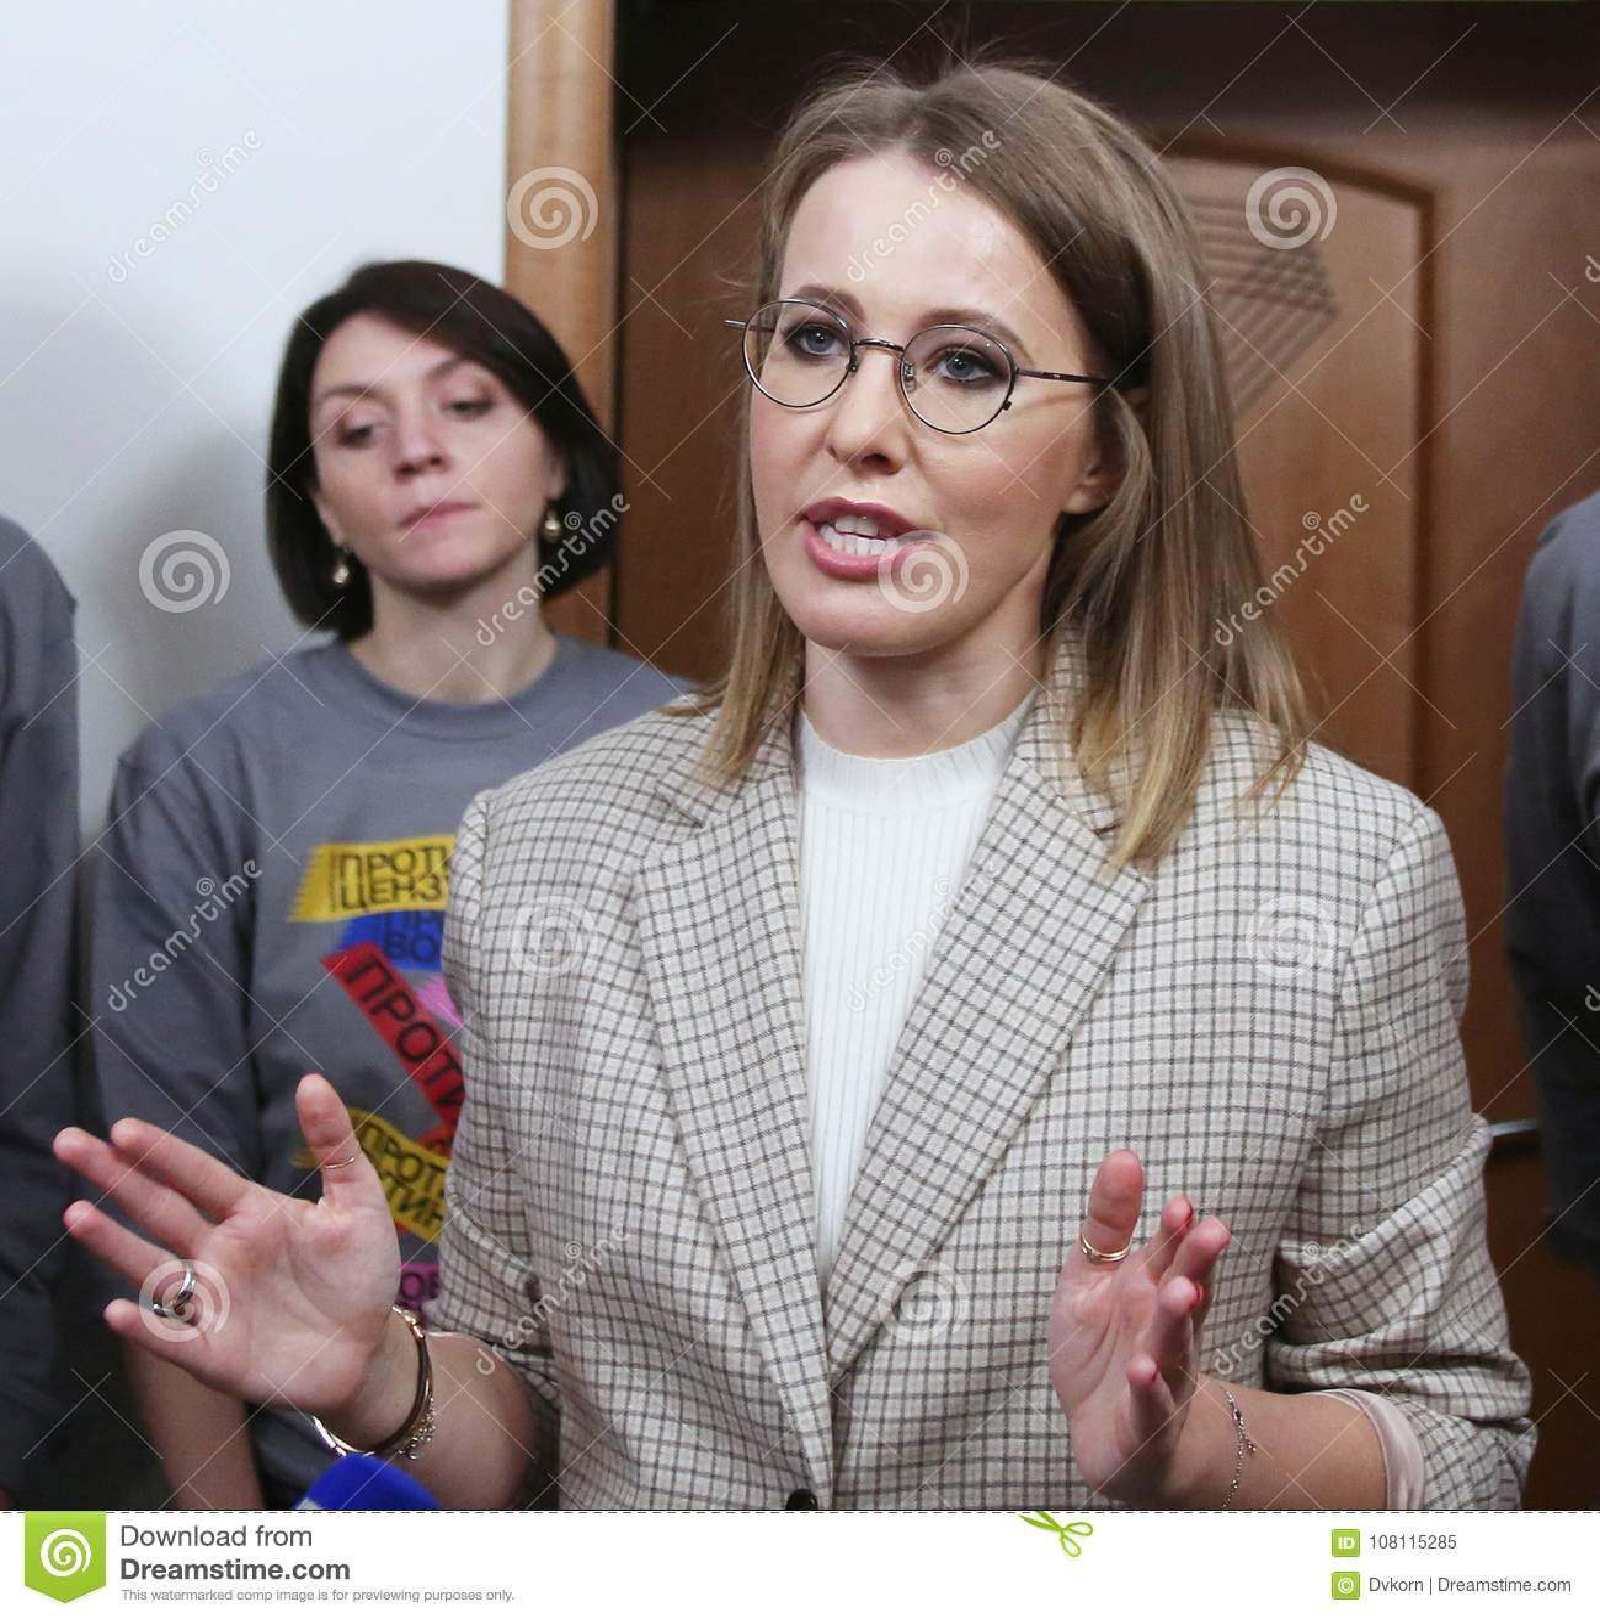 Ksenia Sobchak arranged the sale of things 24.10.2011